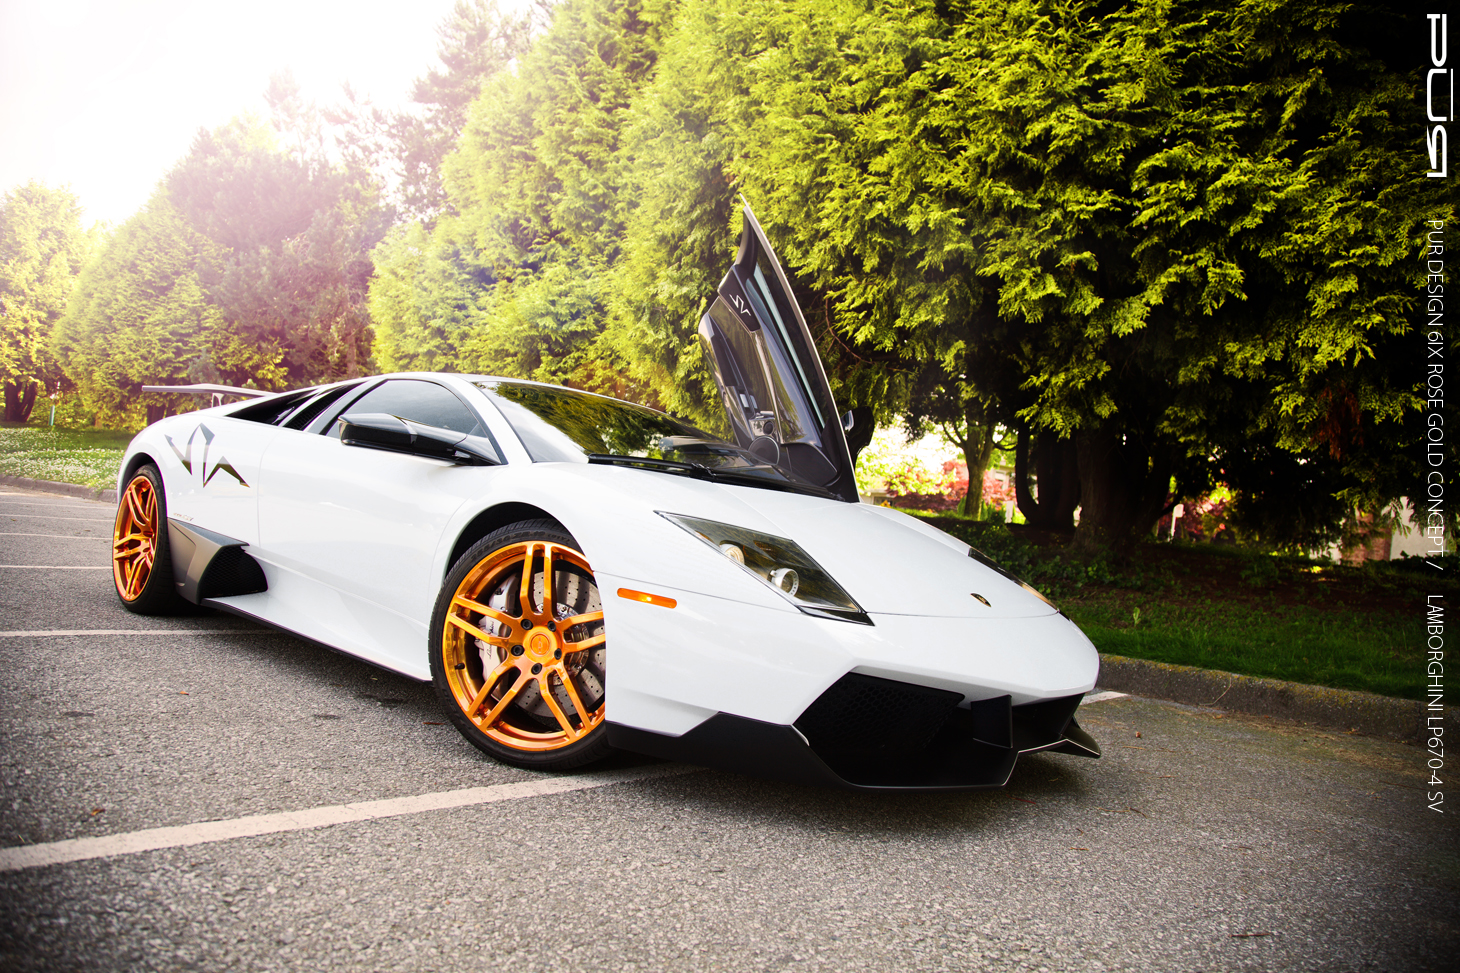 murcielago super cars - photo #41